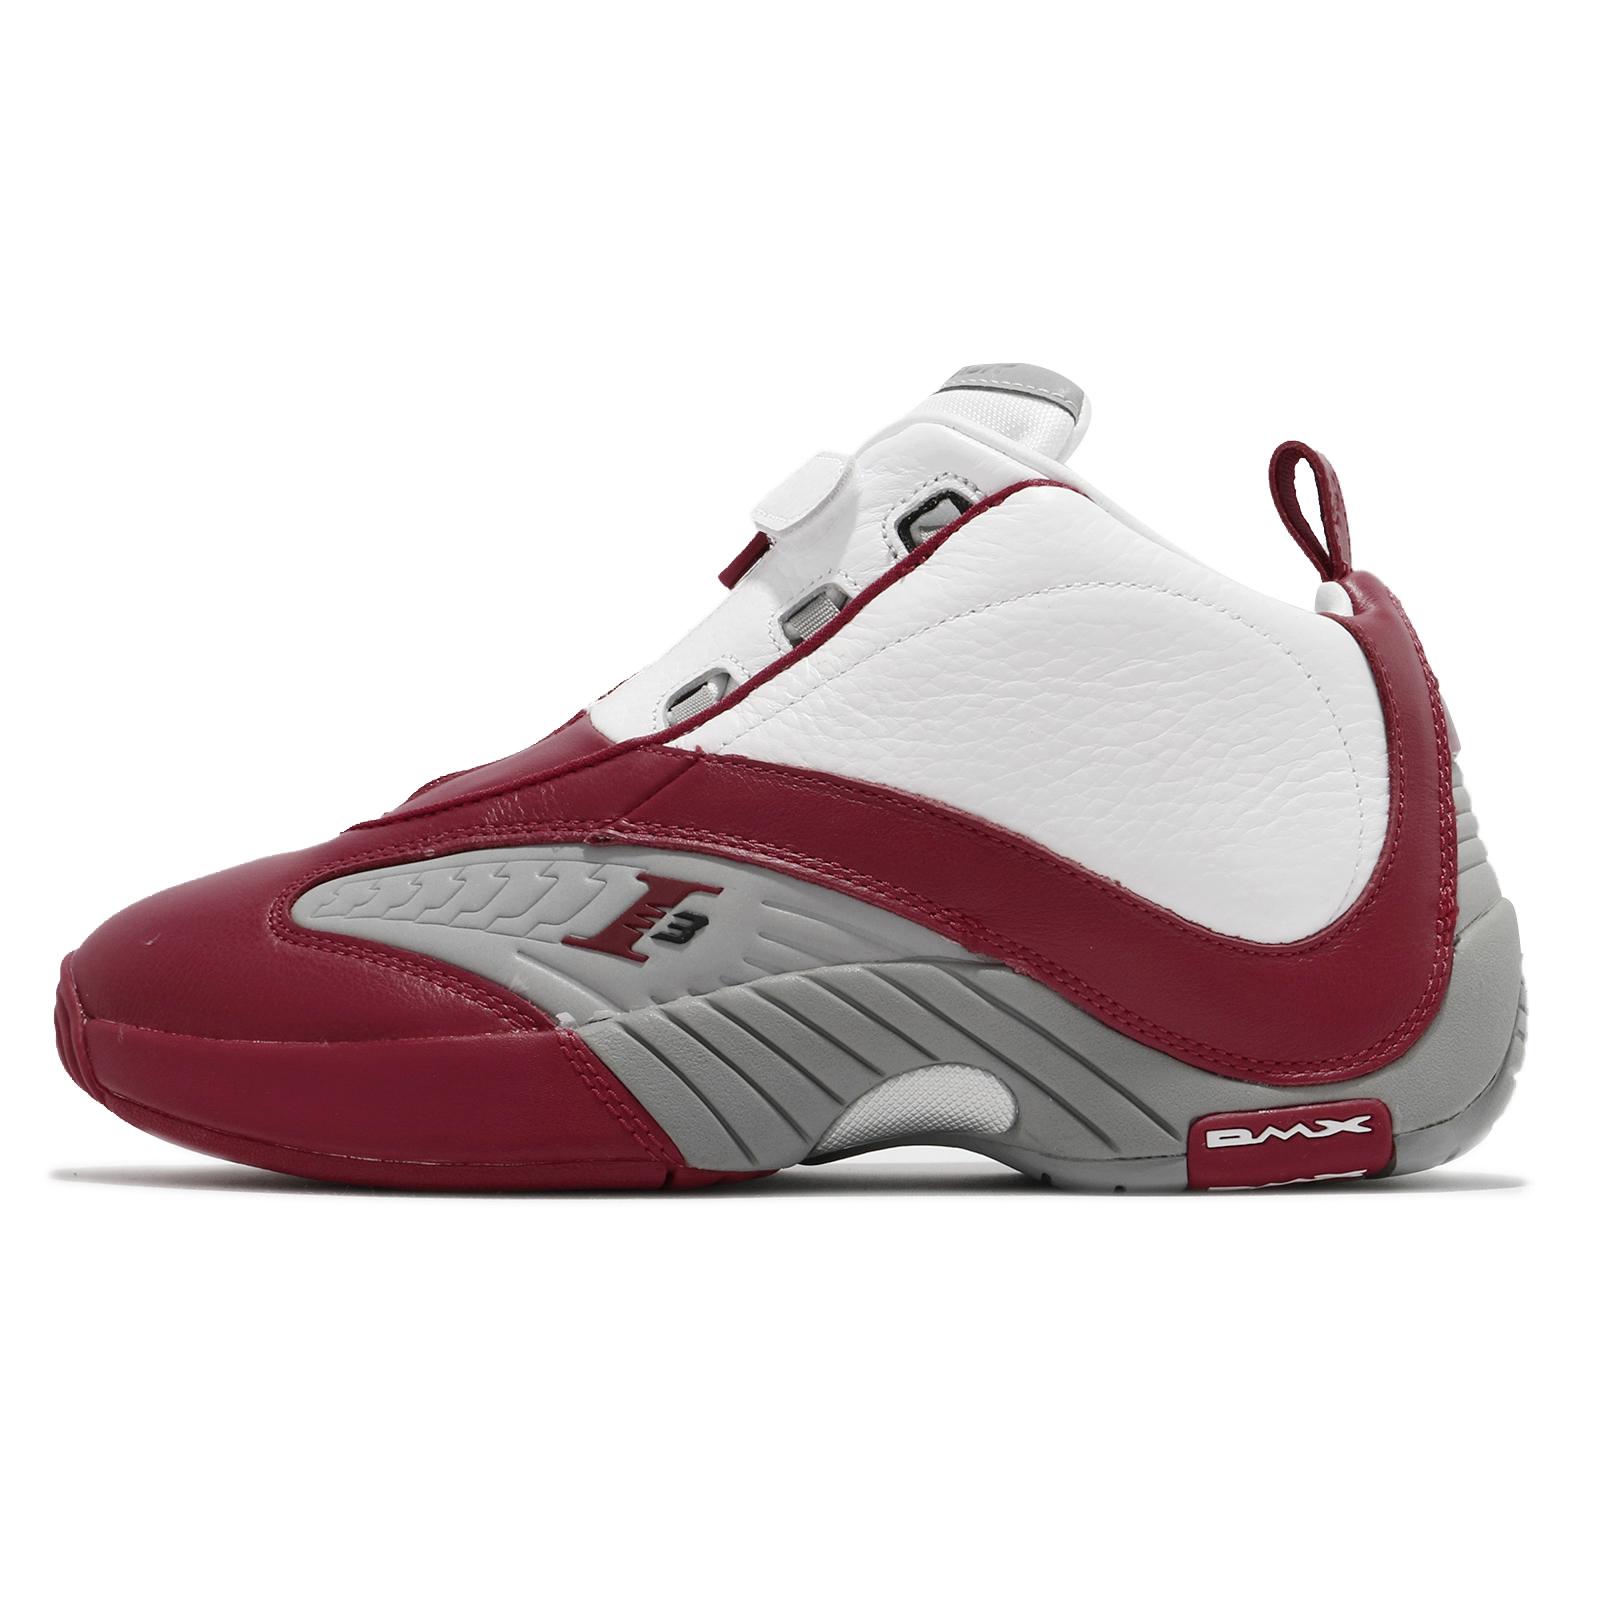 Reebok 籃球鞋 Answer IV OG 4 Allen Iverson 白紅 男鞋 艾佛森 ACS FY9690